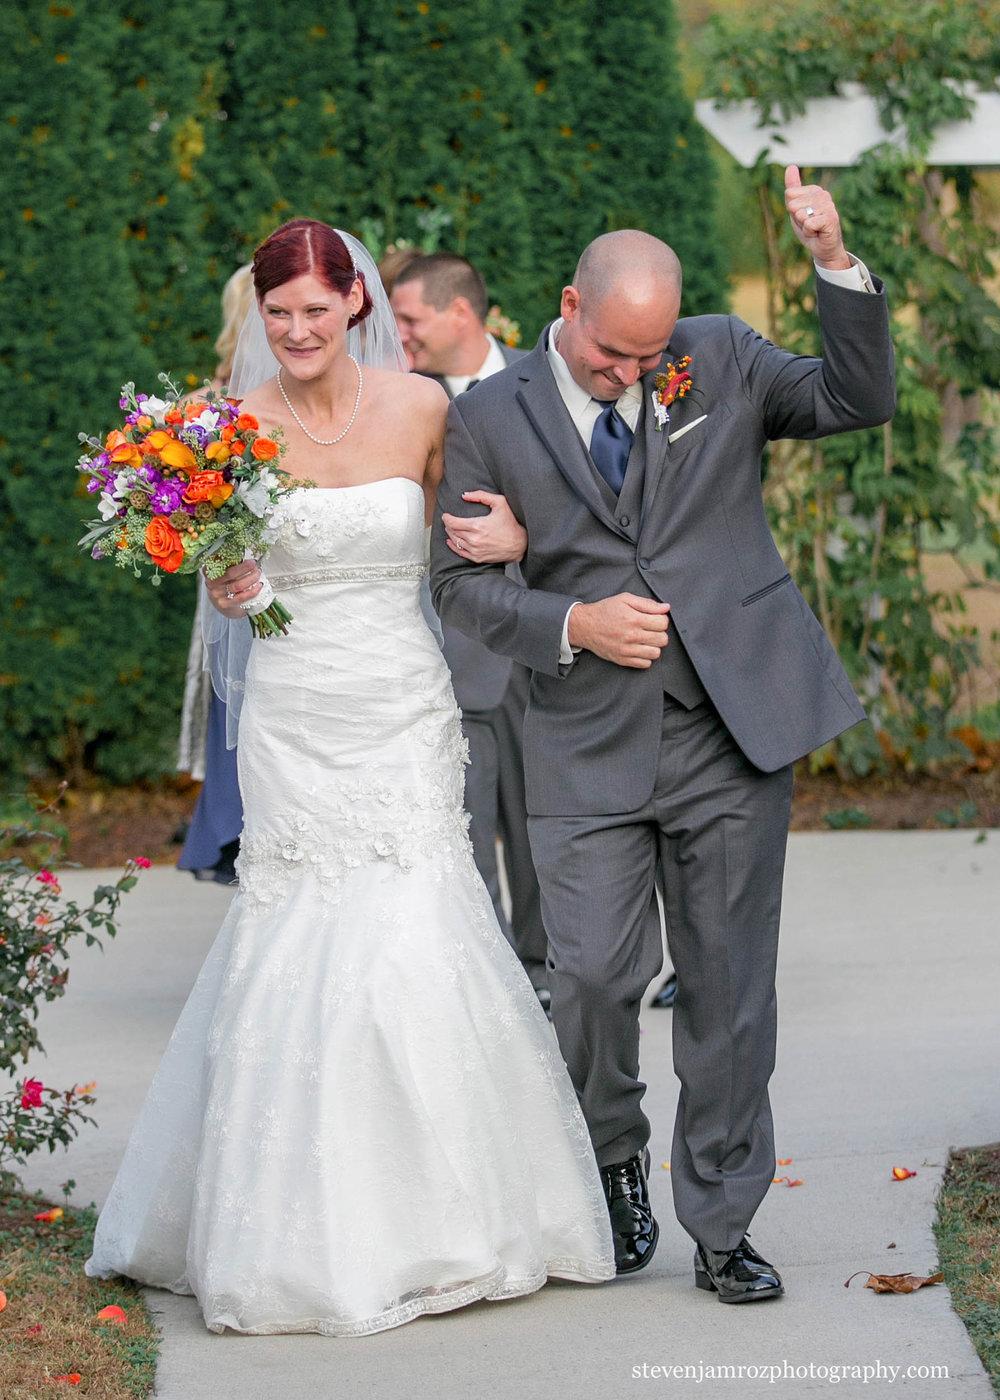 the-columned-garden-wedding-hudson-manor-steven-jamroz-photography-0217.jpg